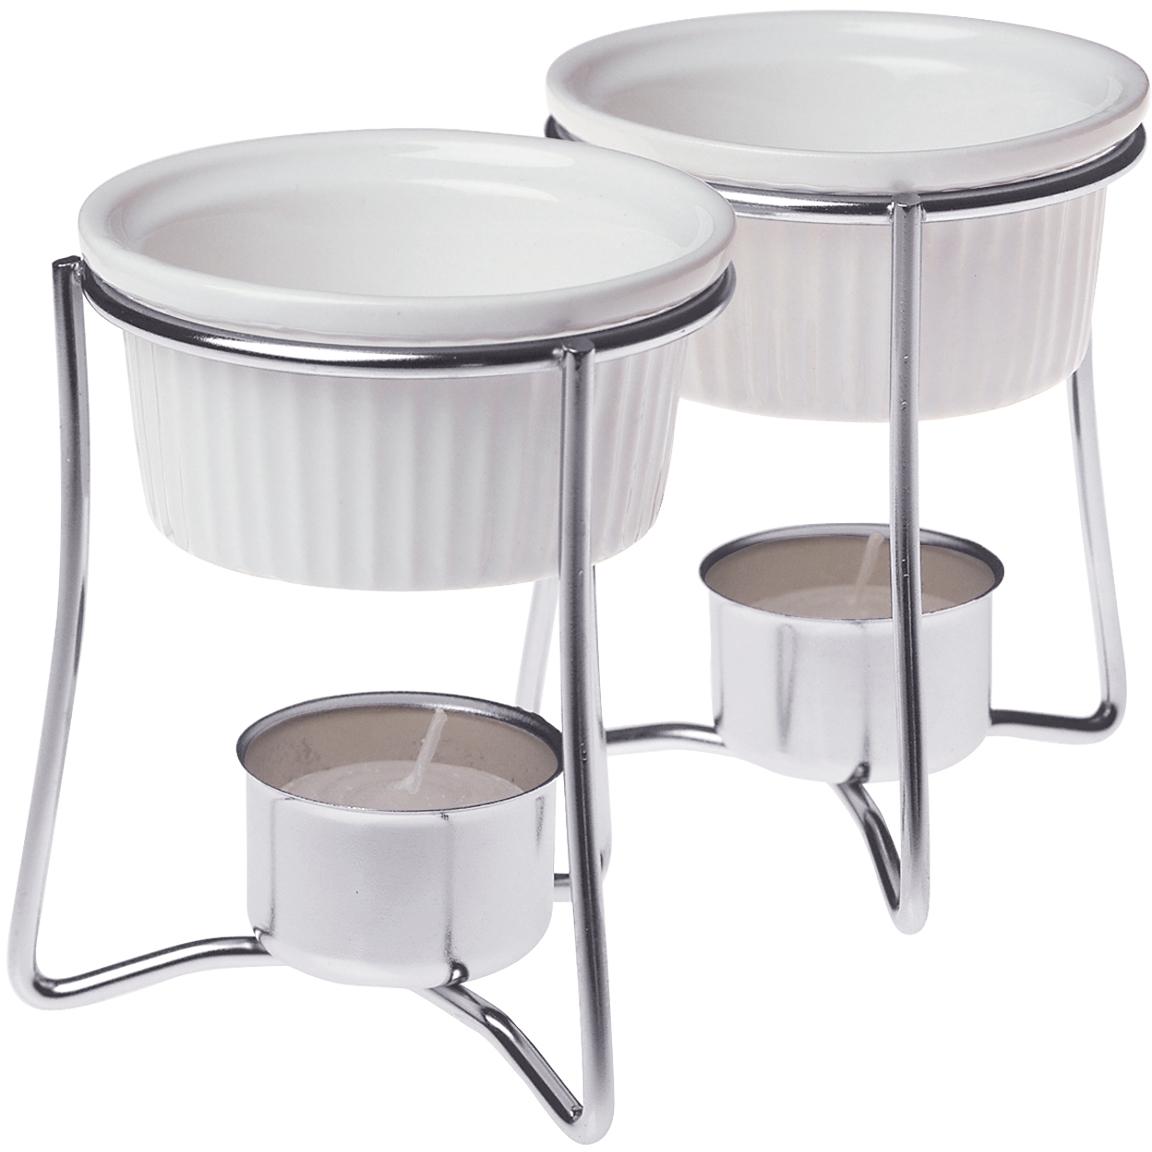 Prepworks by Progressive International Ceramic and Chrome Plated Steel Butter Warmer, Set of 2